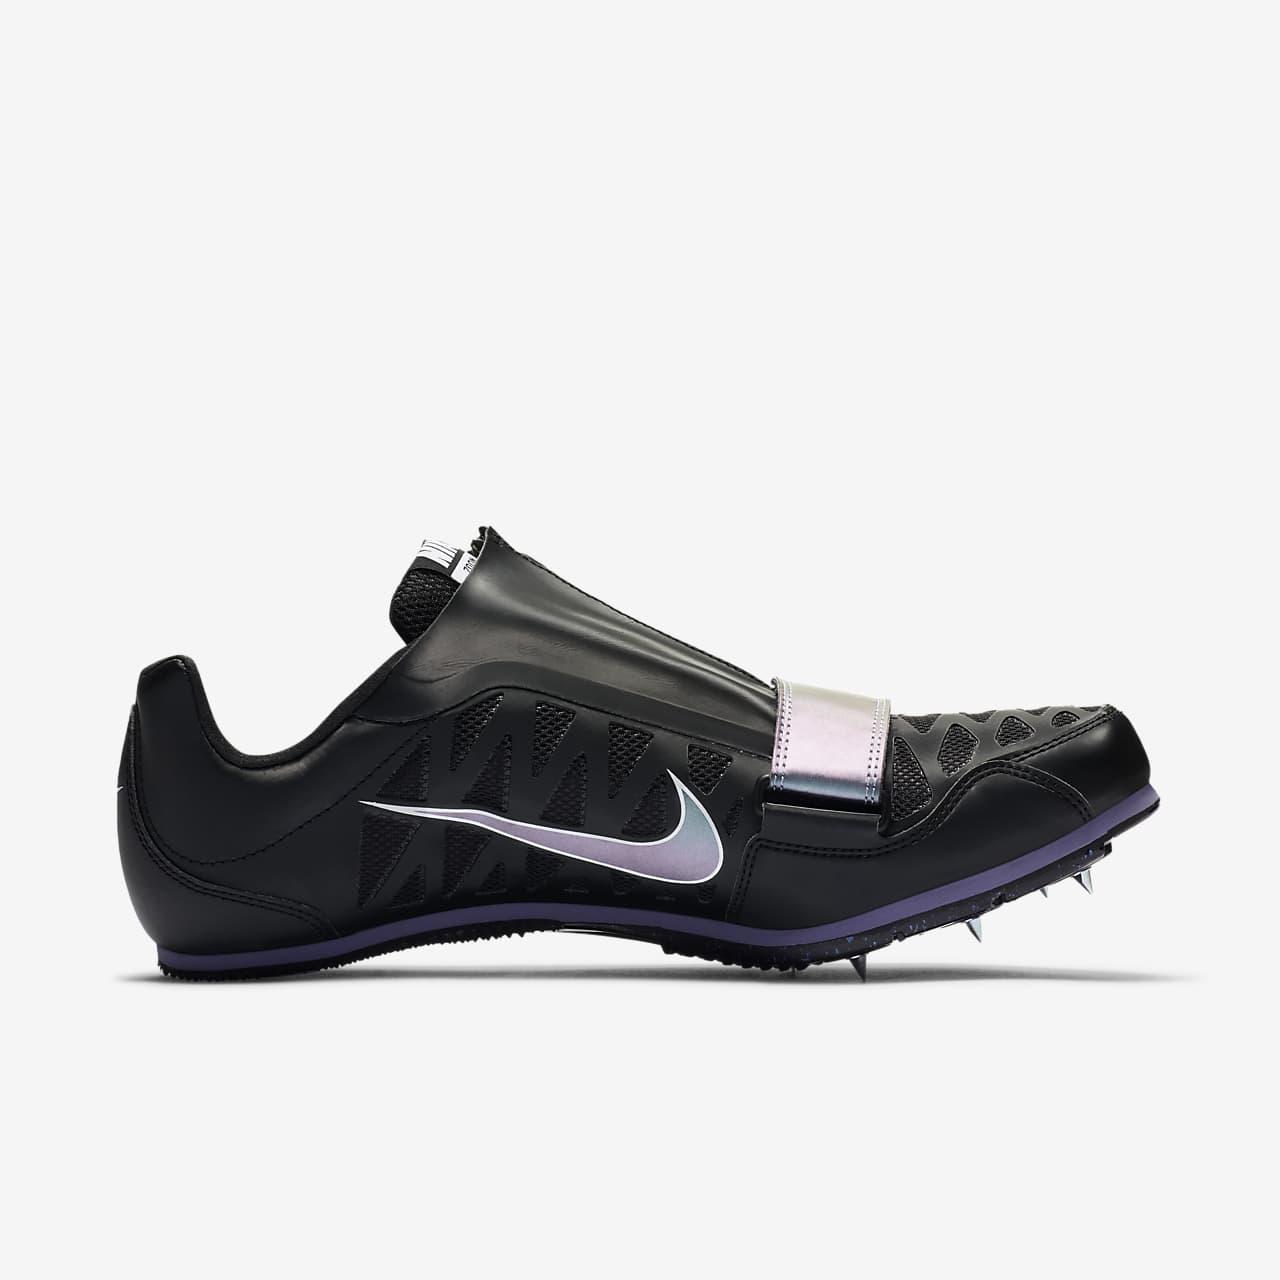 Nike Zoom LJ 4 Unisex Jumping Spike